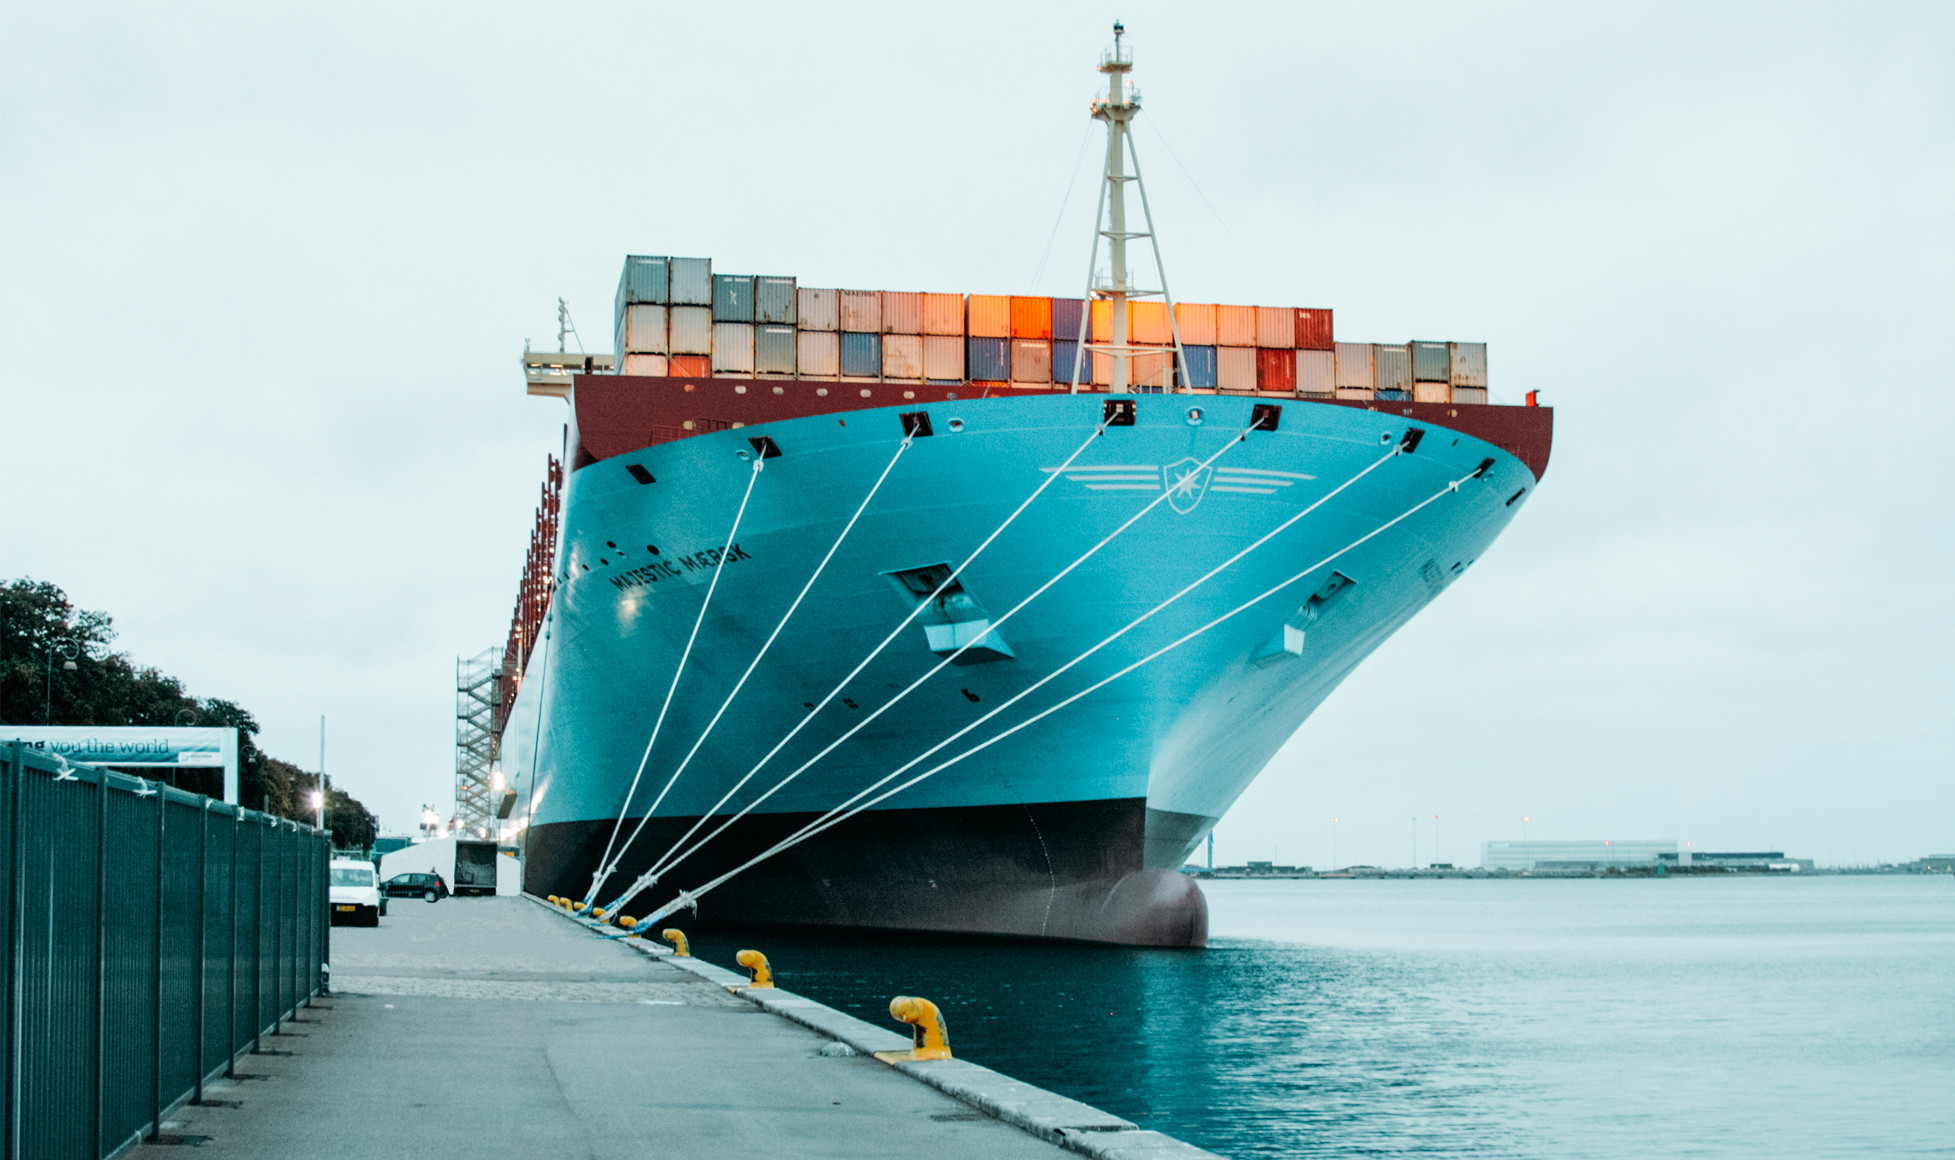 Maersk-8-Col_1955x1160